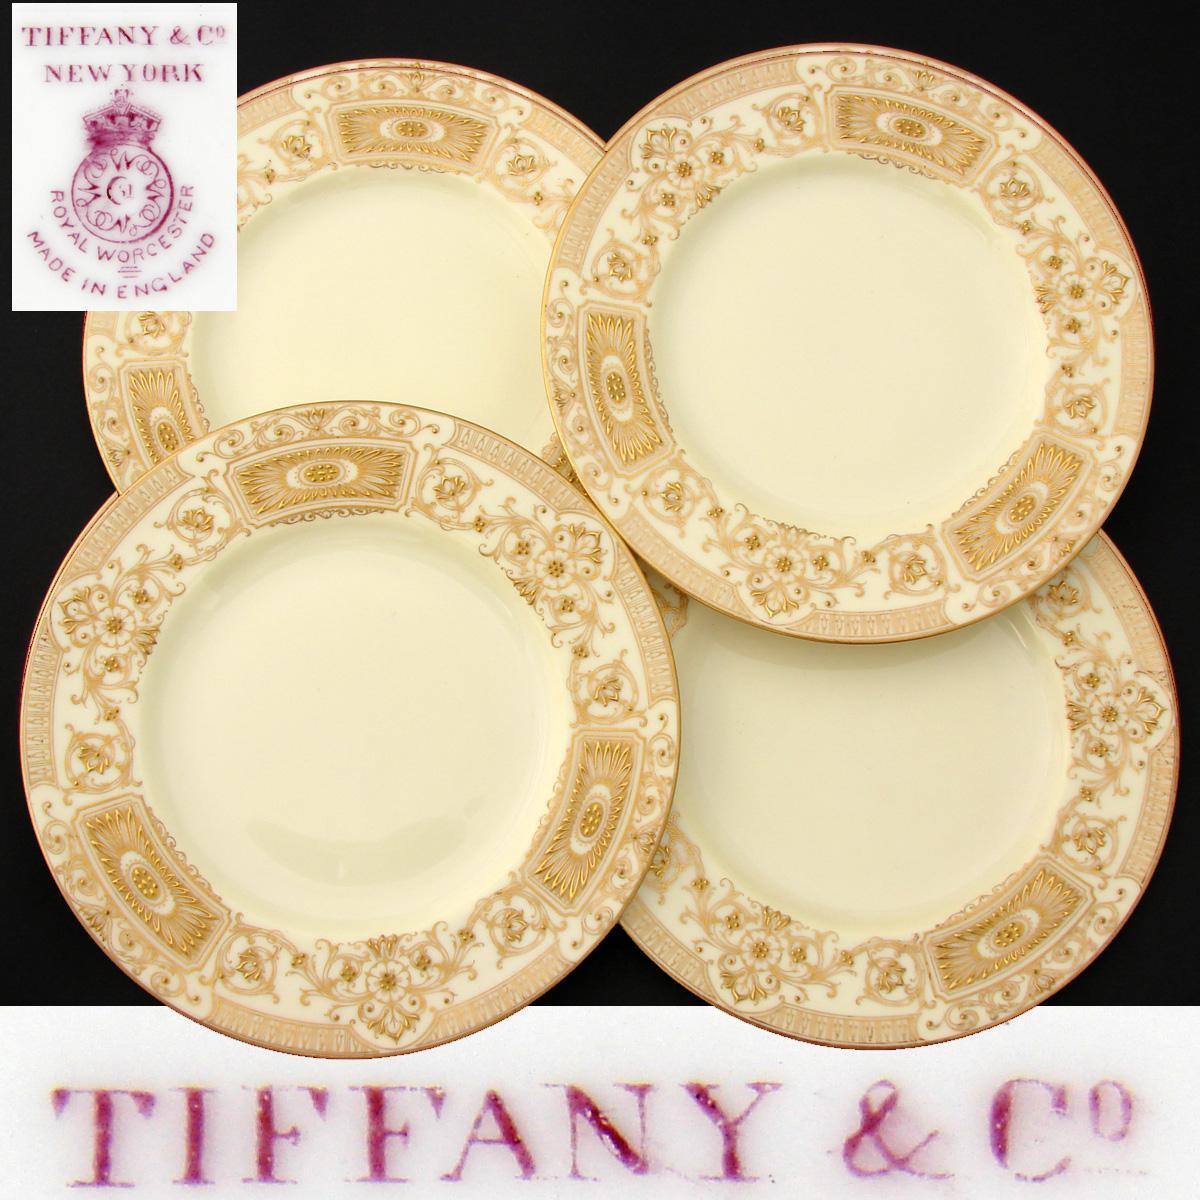 "Set of 4 Antique Royal Worcester 9.25"" Plates, Elegant Raised & Encrusted Gold Enamel, Tiffany & Co."